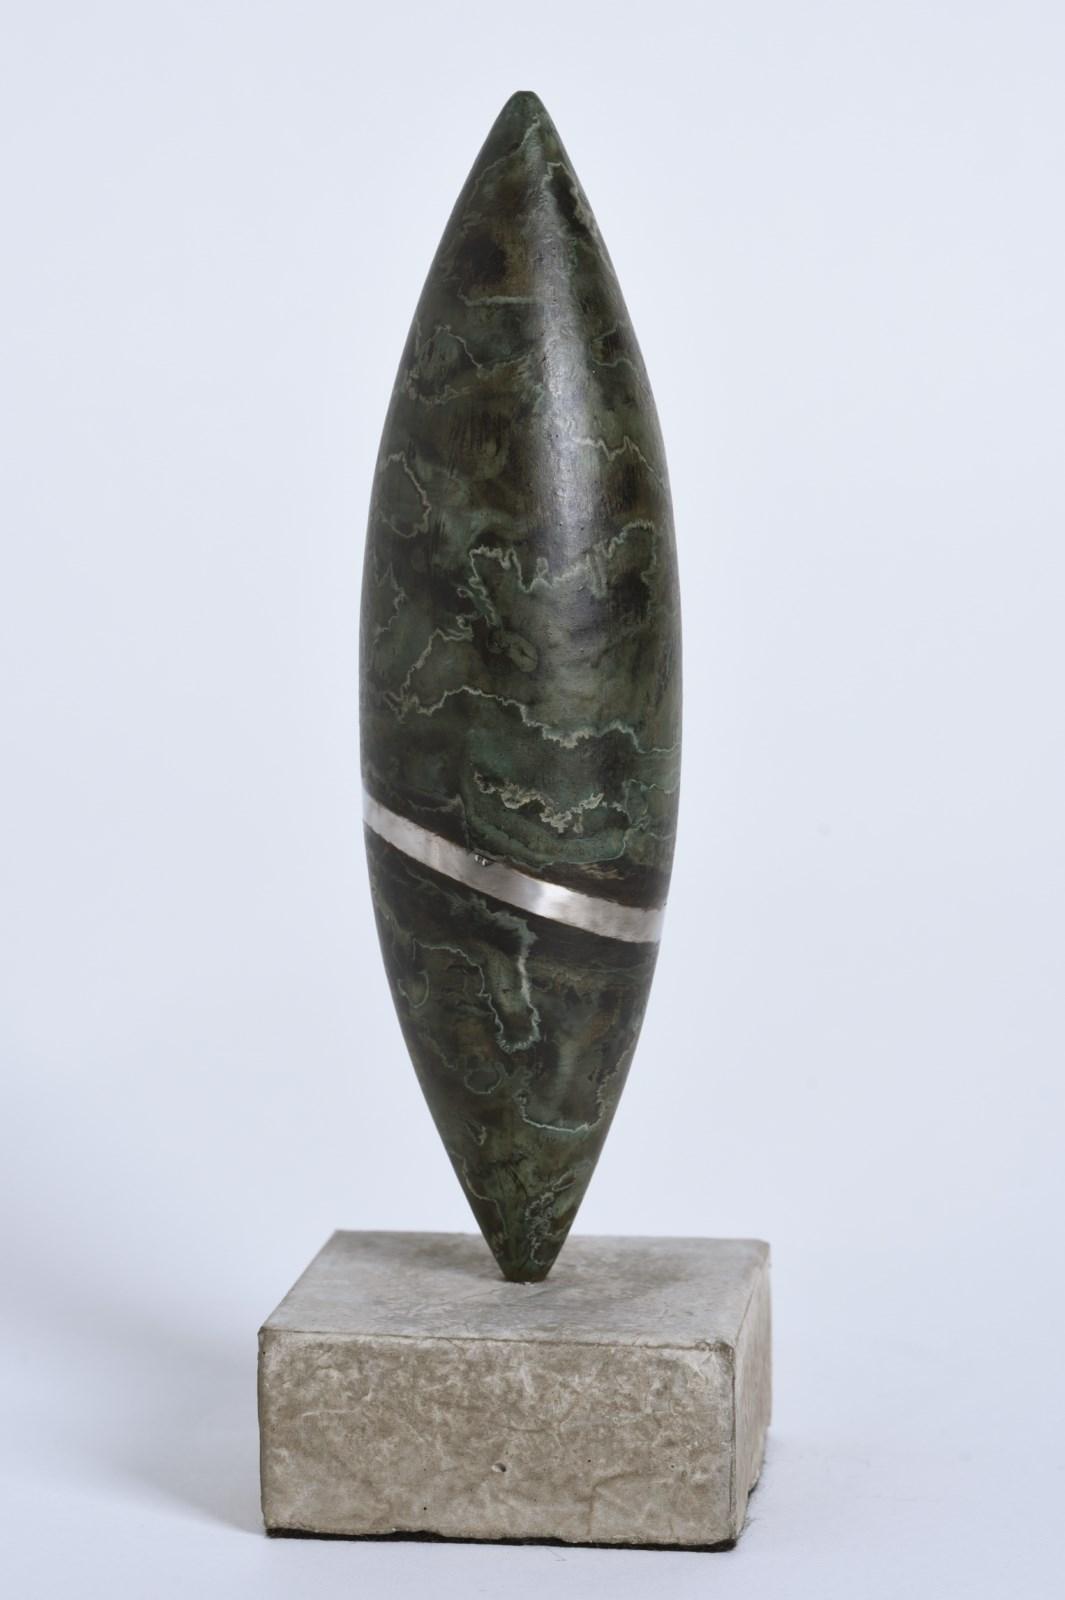 Sculpture-fer-patine-verni-veine-inox-poli-socle-beton-hauteur:21cm-2016